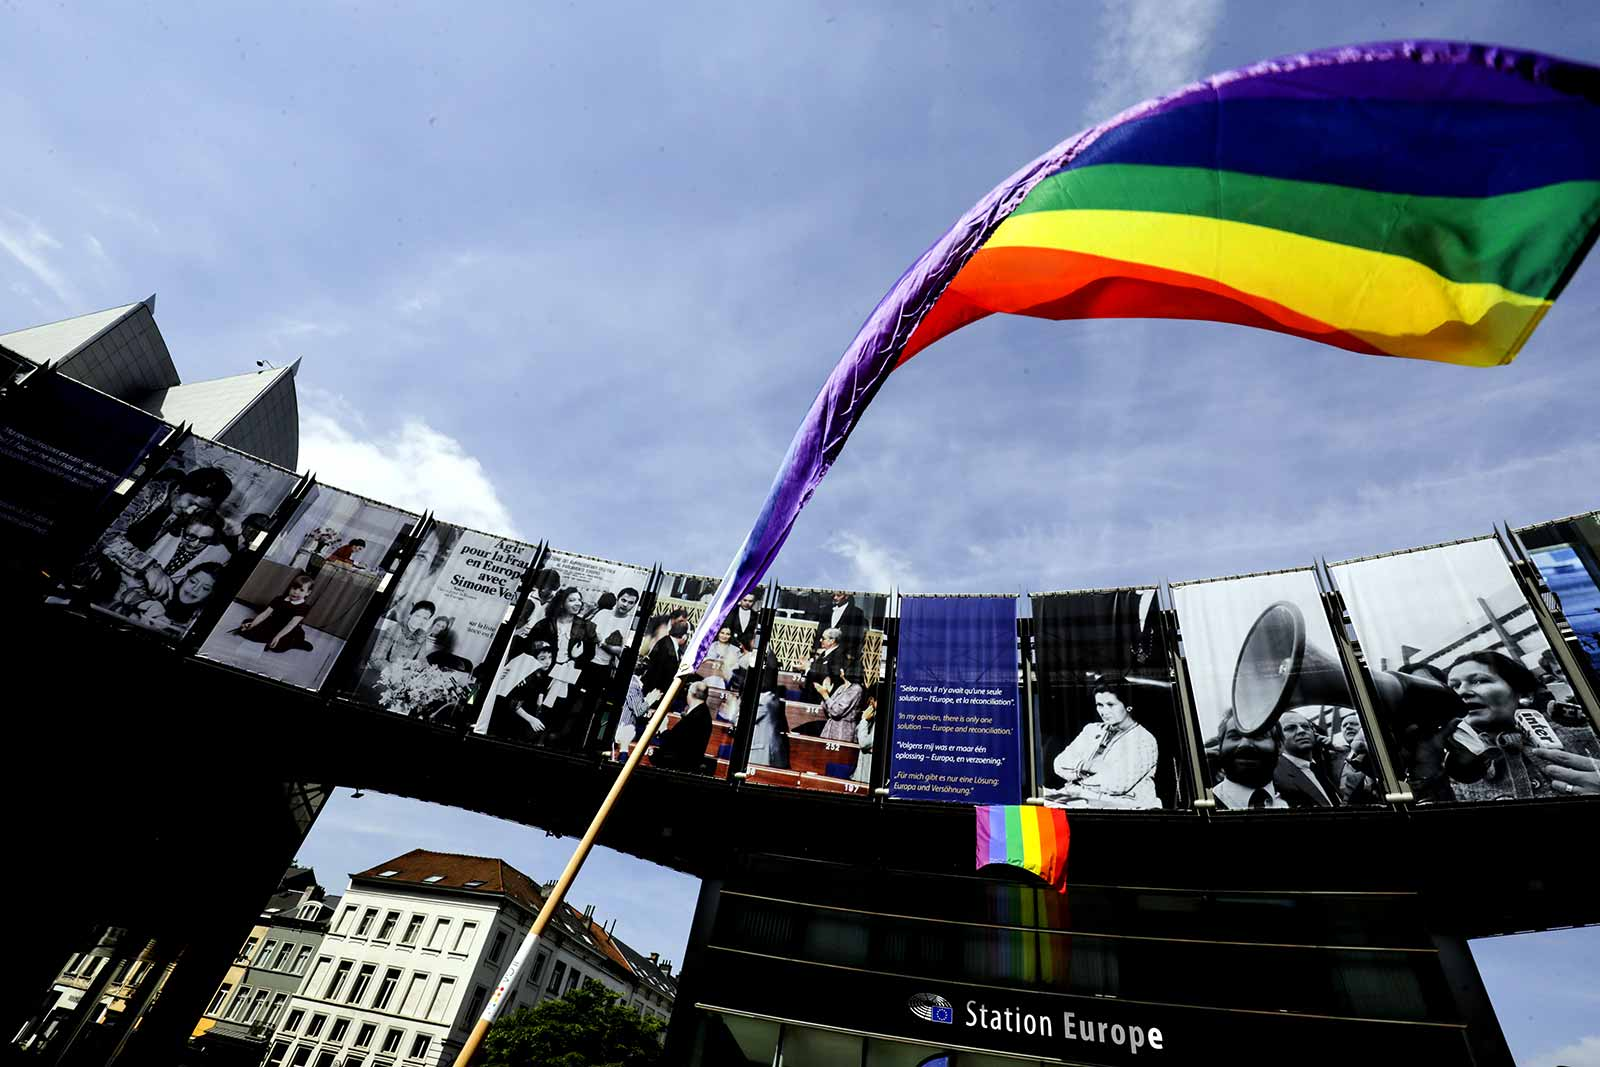 Lesbian, Gay, Bisexual, Transgender, Intersex LGBTI equality in the EU